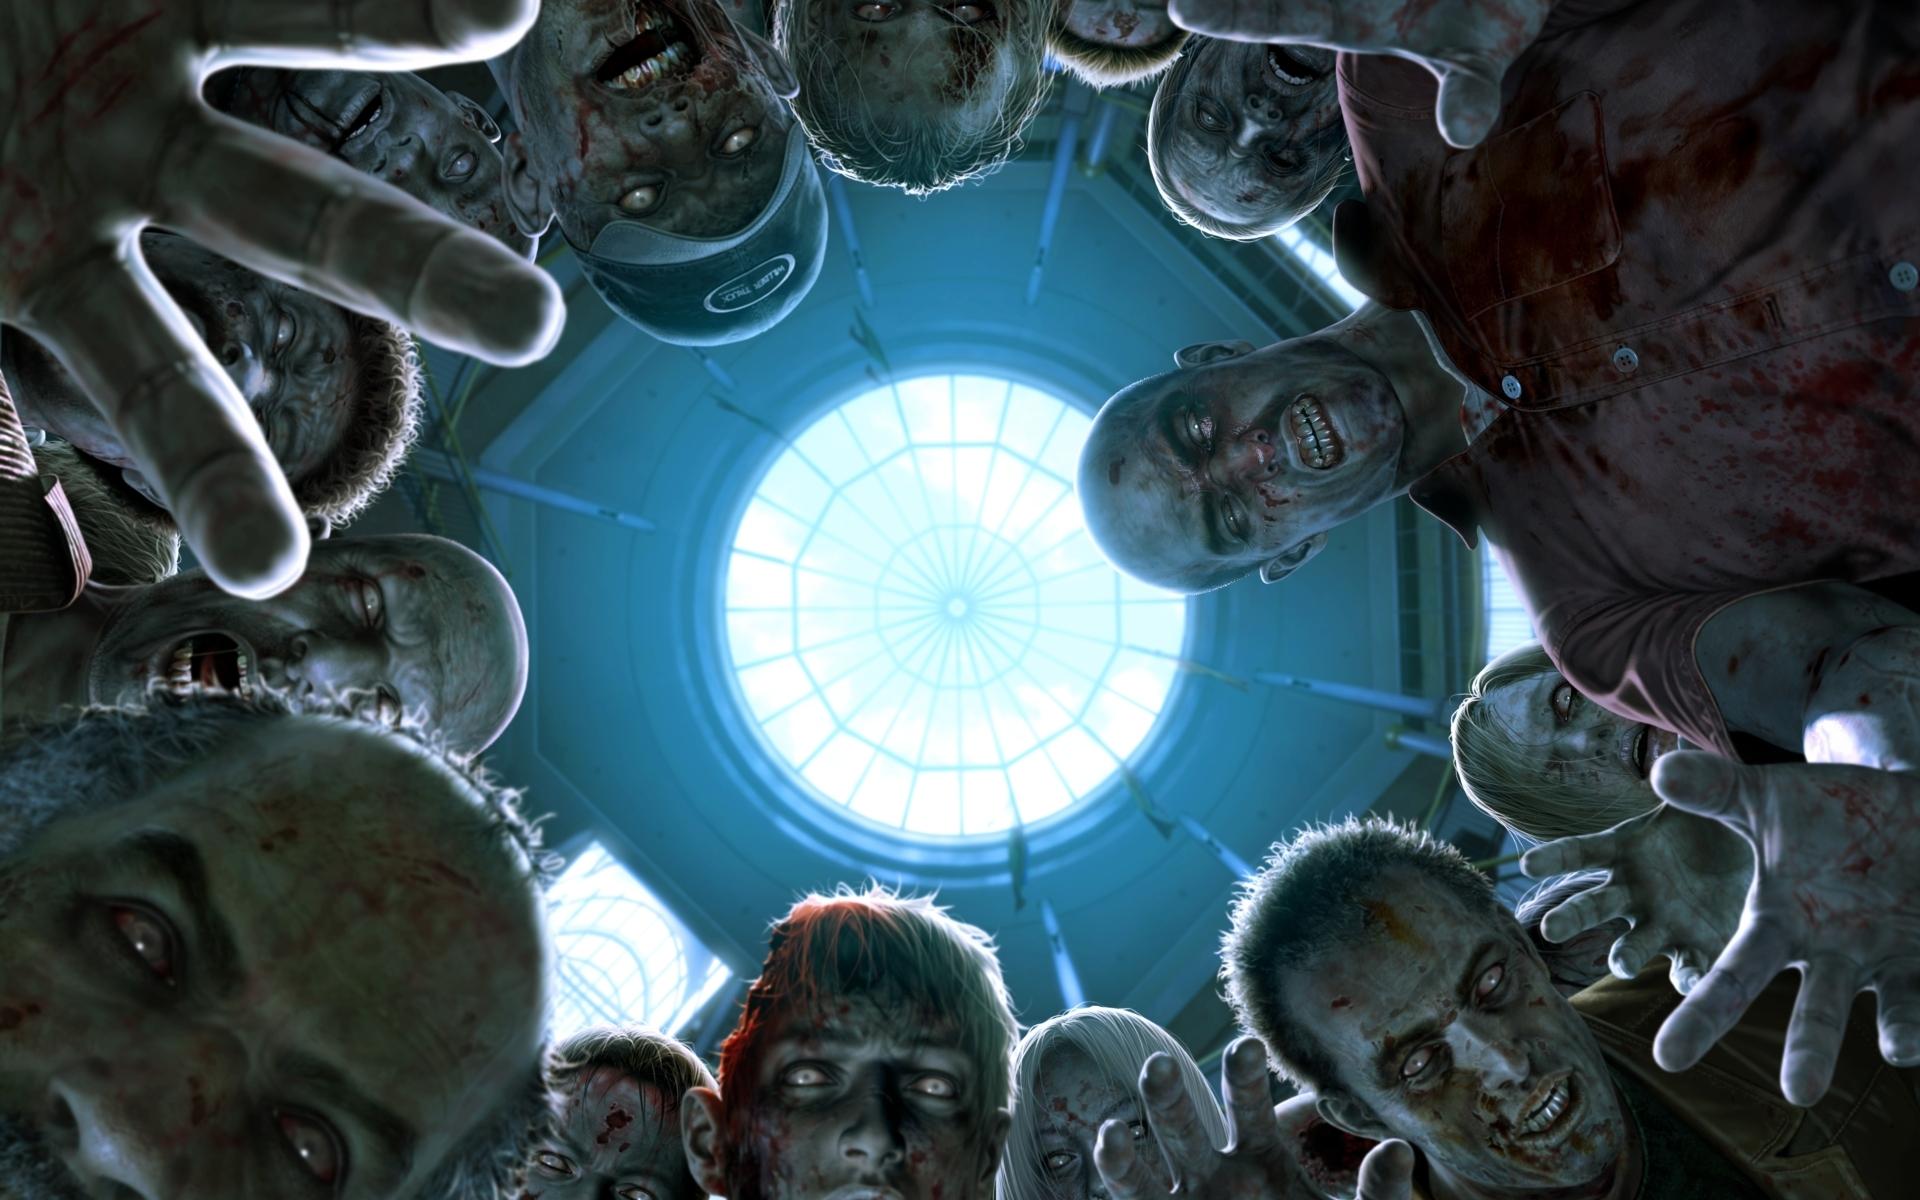 Zombies wallpaper 15327 1920x1200